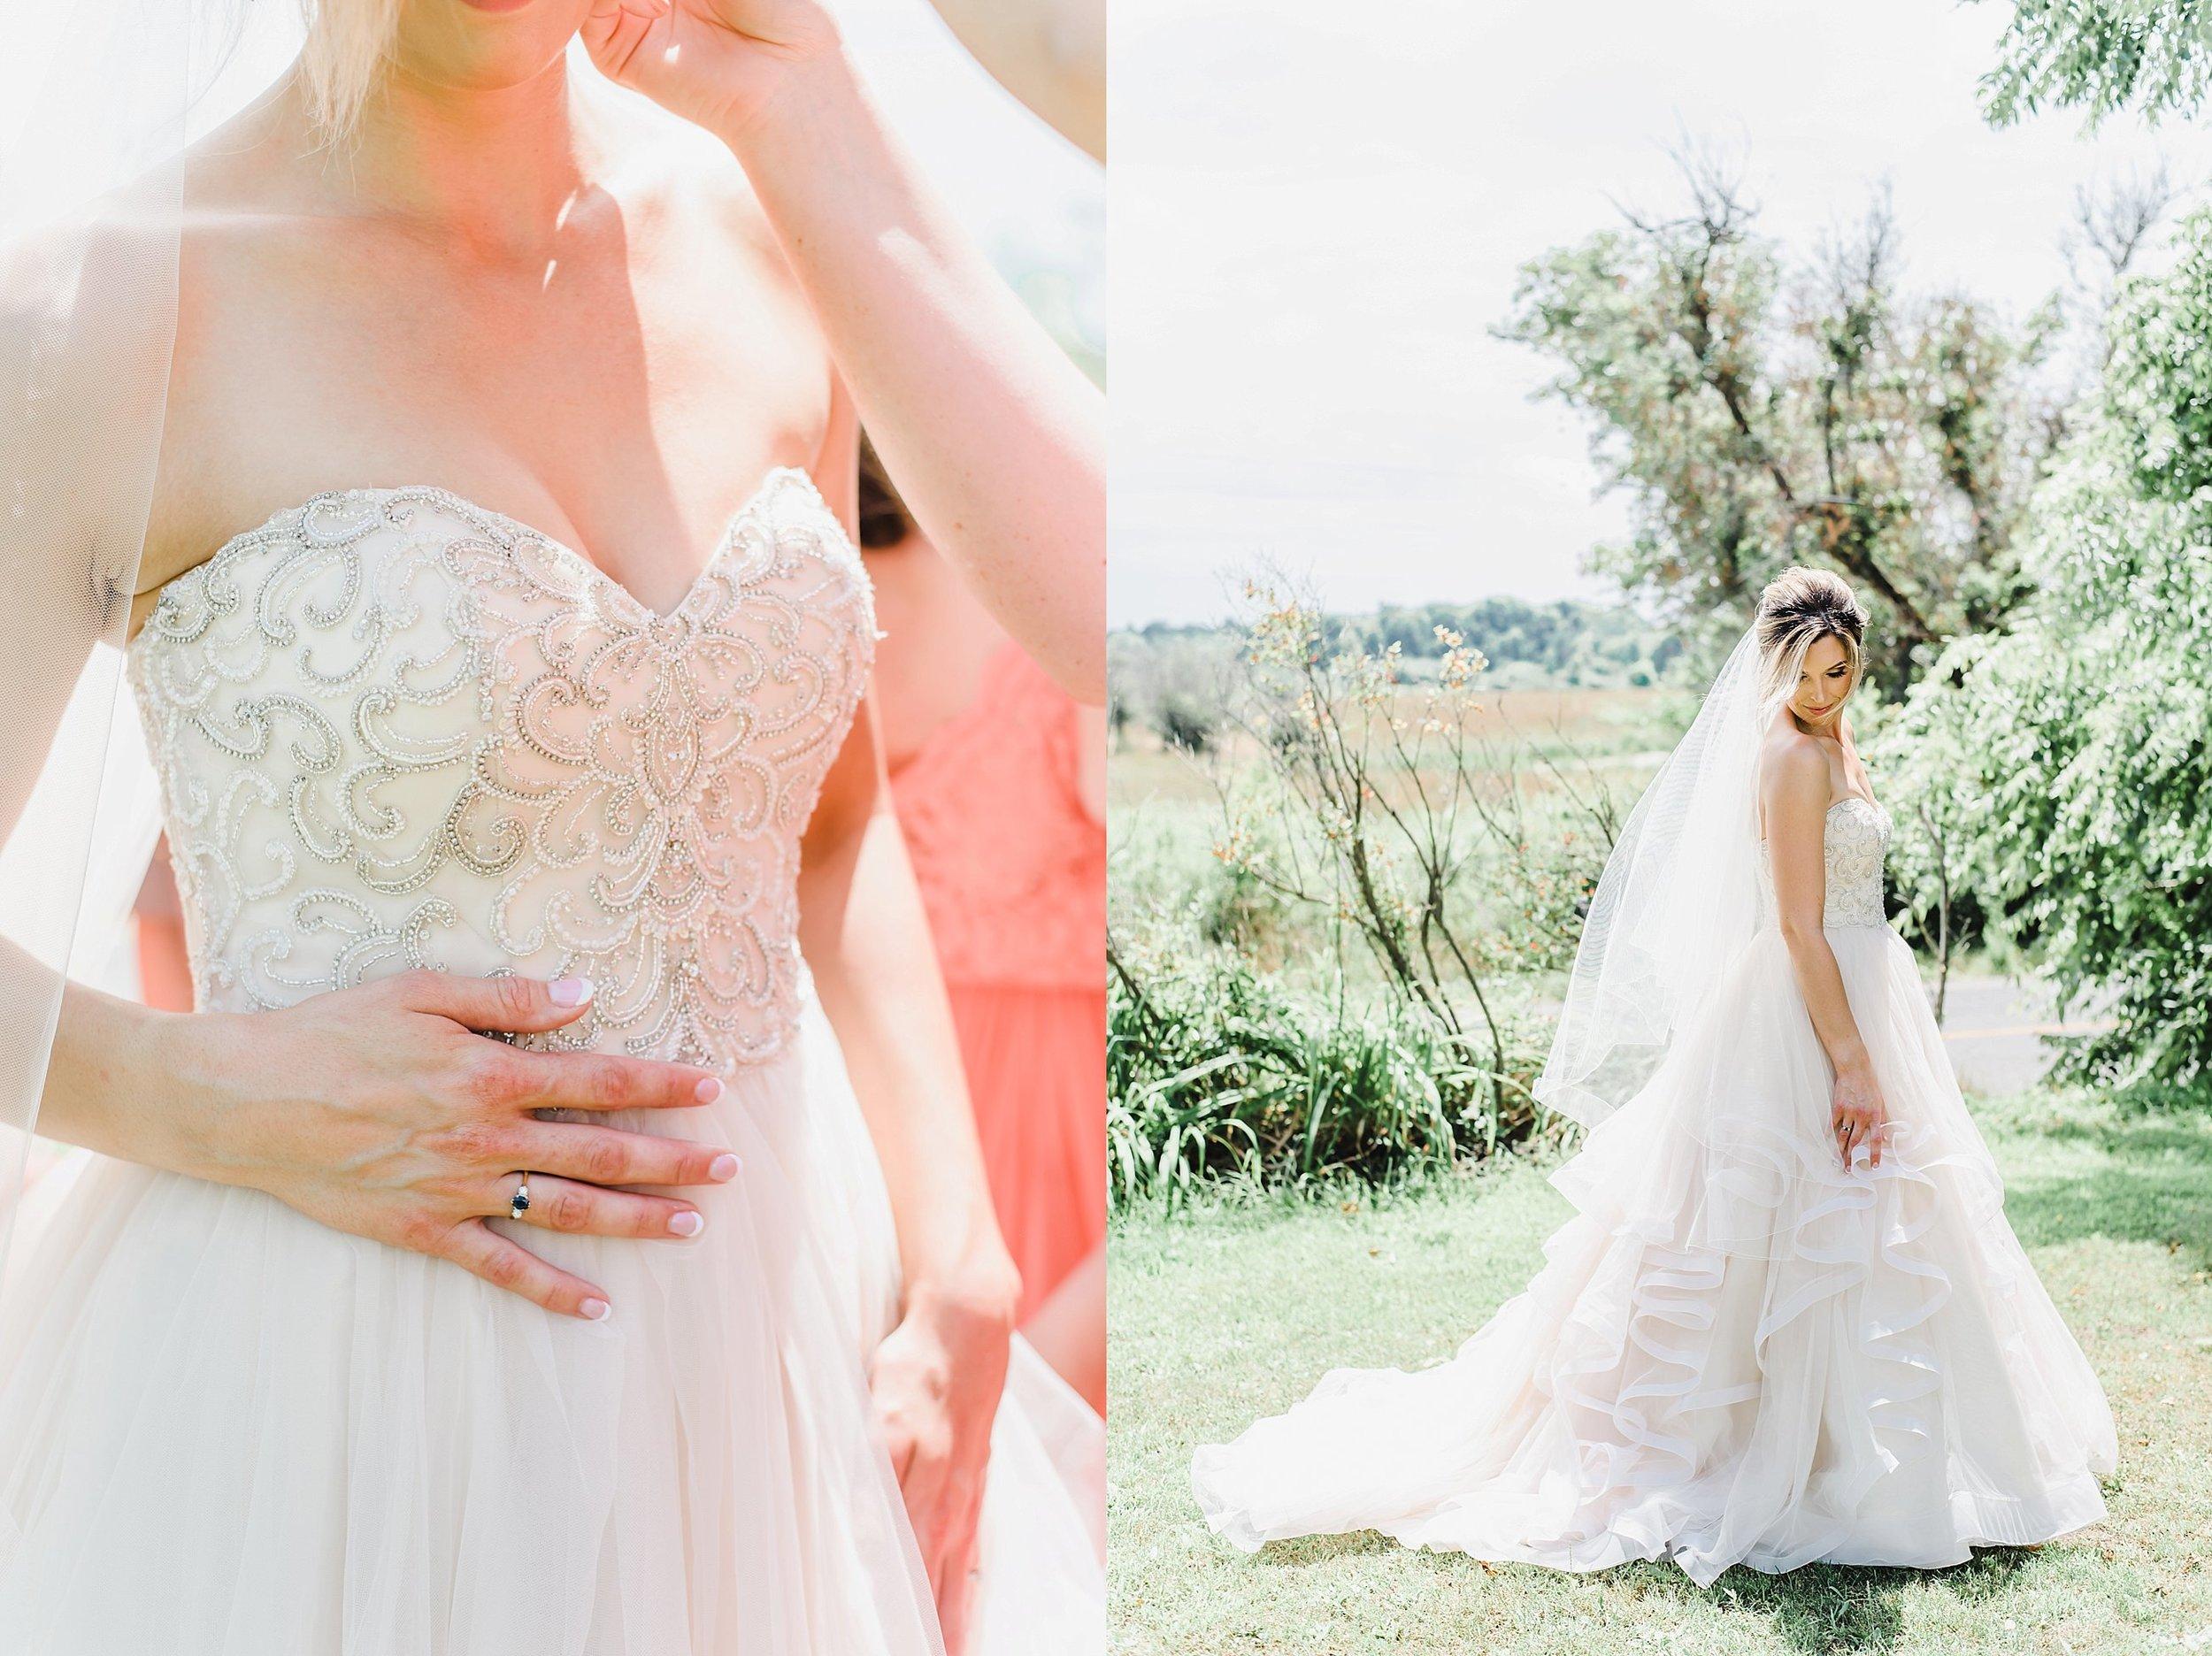 light airy indie fine art ottawa wedding photographer | Ali and Batoul Photography_0140.jpg